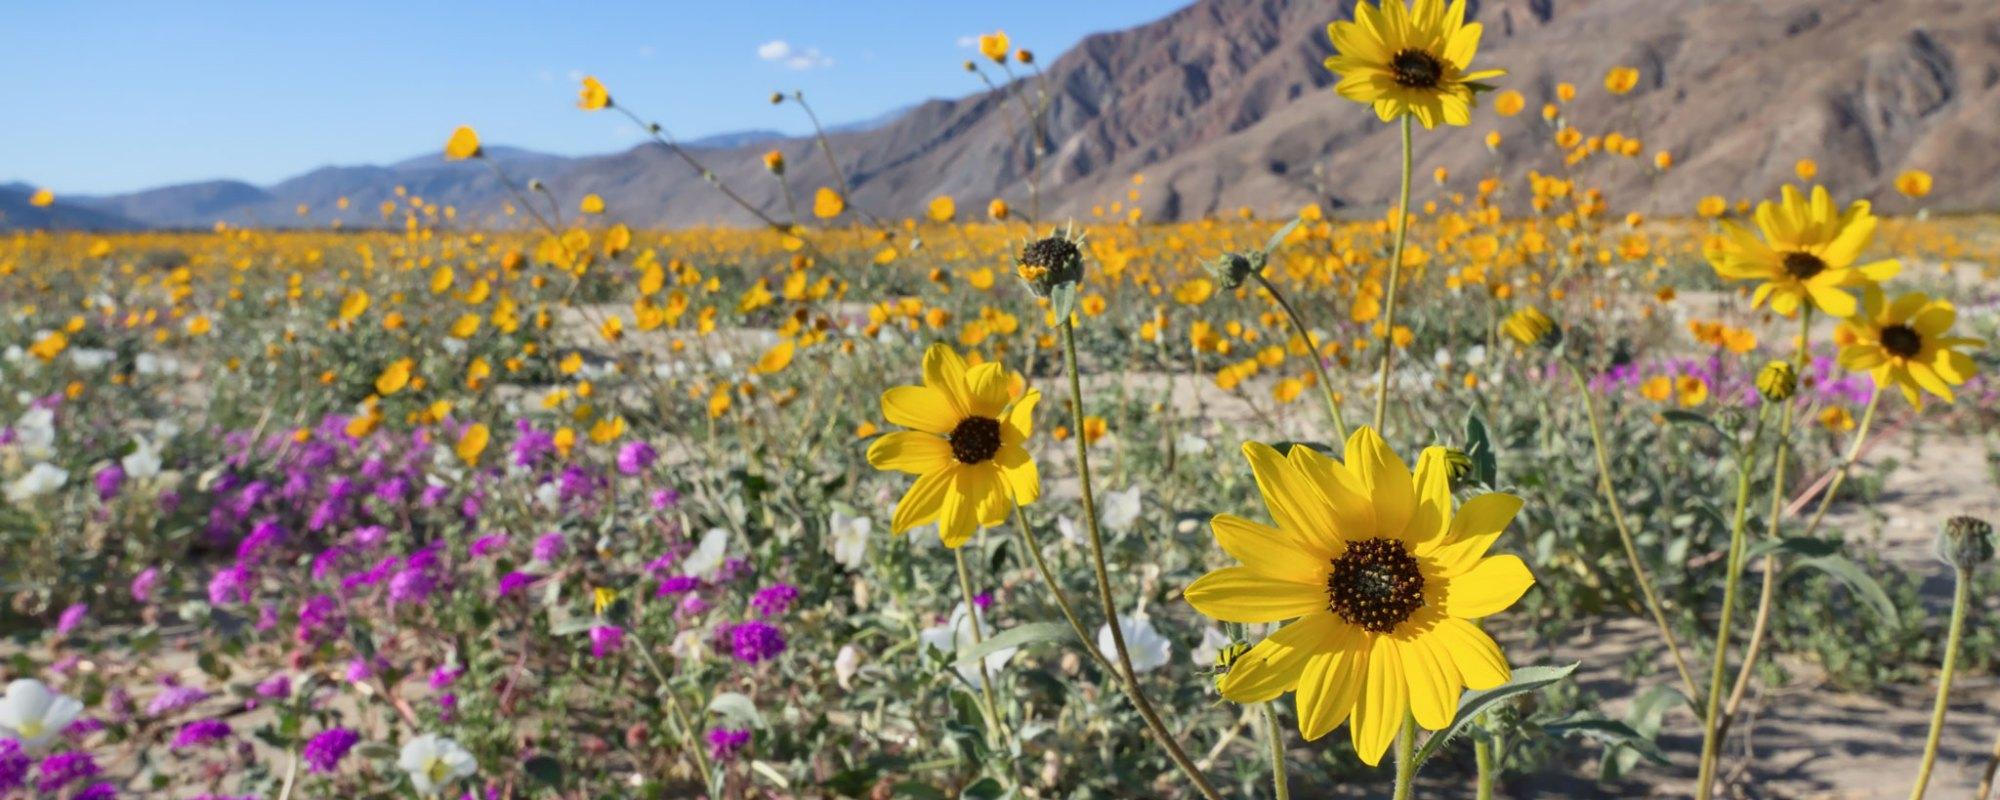 wildflowers in the Anza Borrego desert